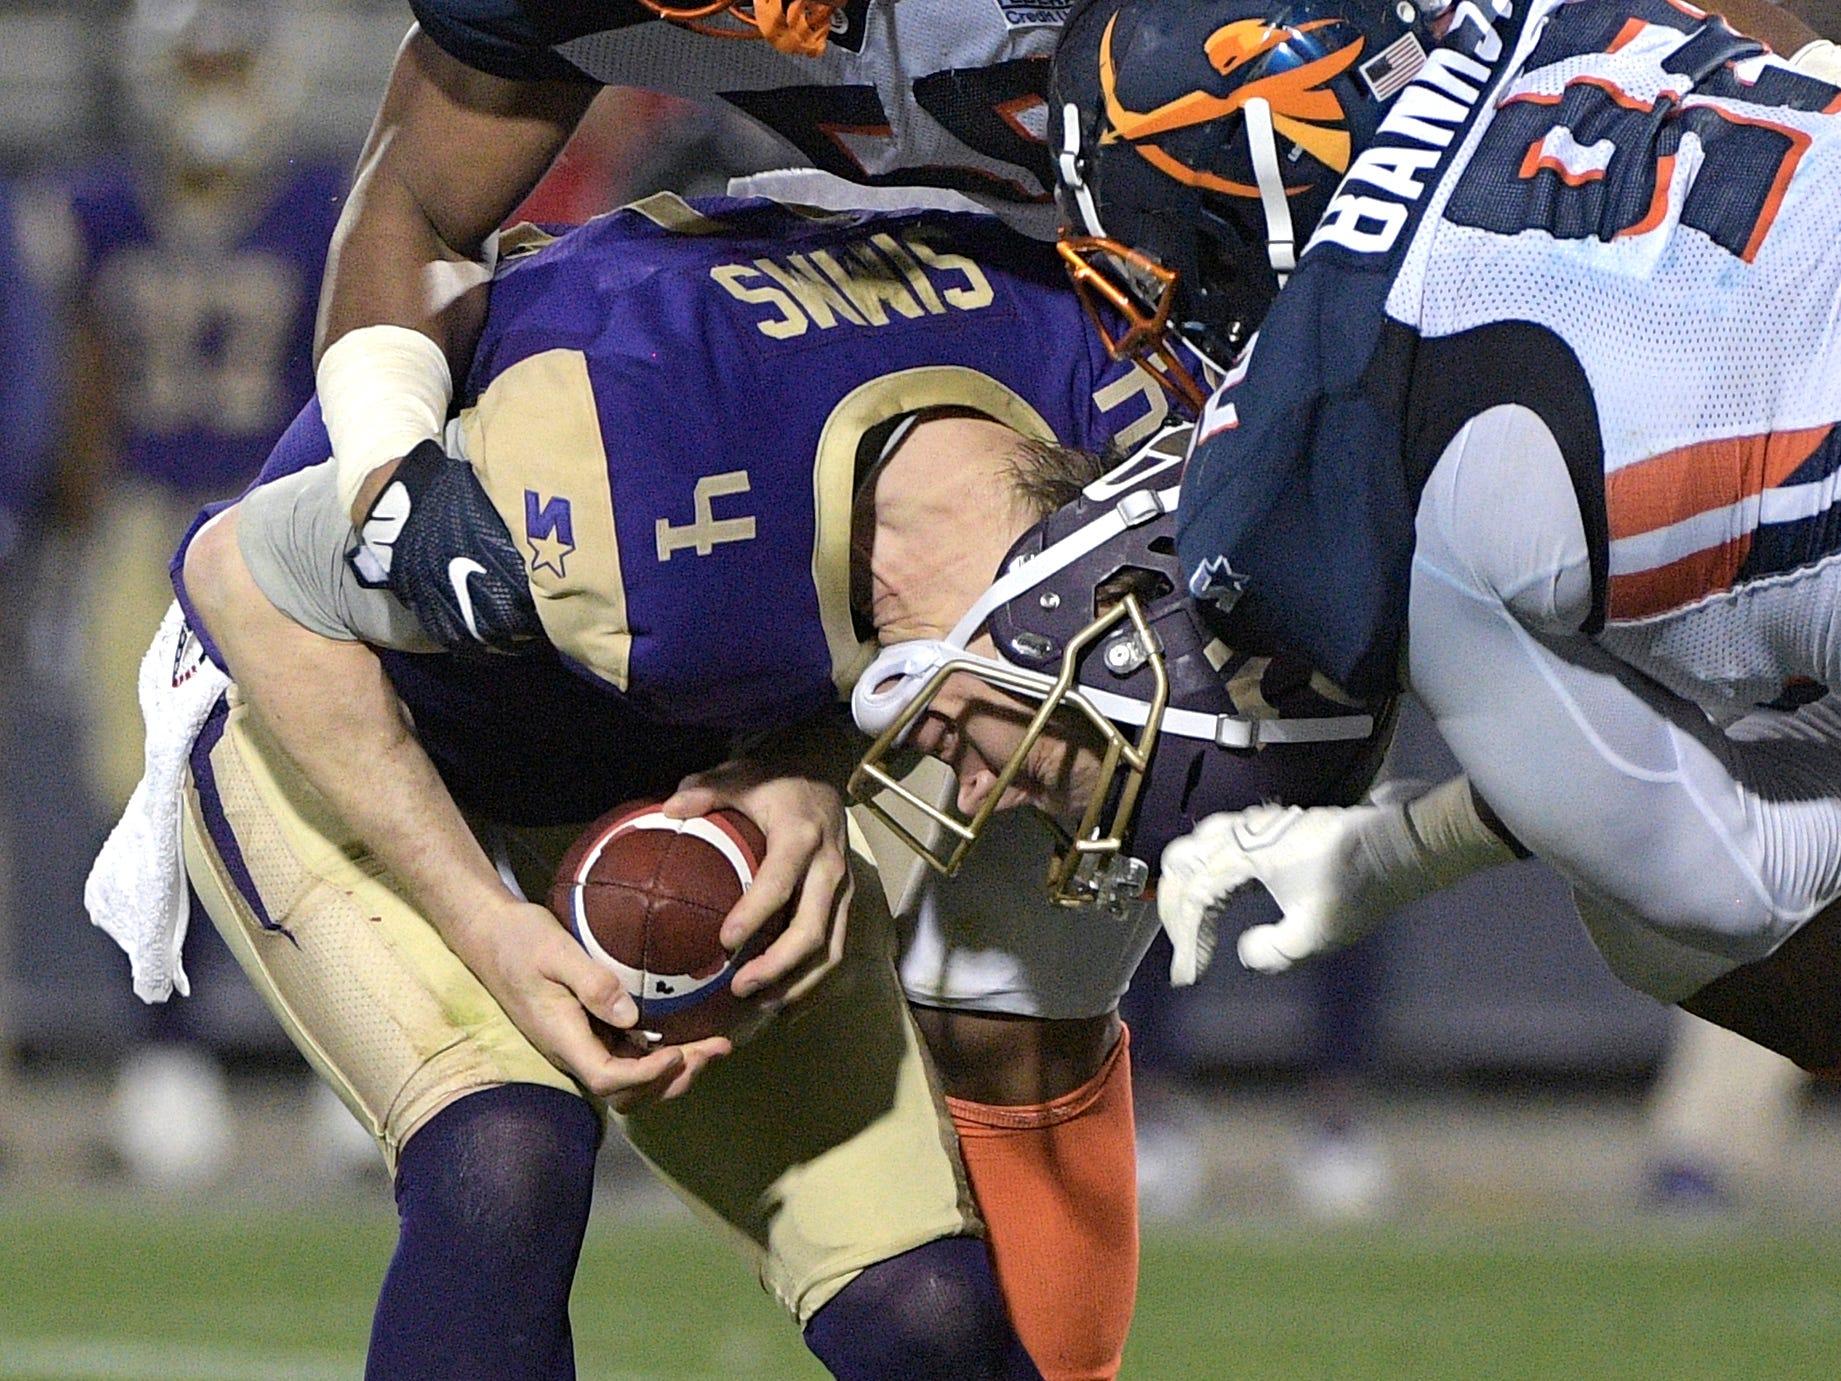 Atlanta Legends quarterback Matt Simms (4) is sacked by Orlando Apollos linebacker Christian French (58) and Josh Banks Sr. (92) during the first half of an Alliance of American Football game Saturday, Feb. 9, 2019, in Orlando, Fla. (AP Photo/Phelan M. Ebenhack)